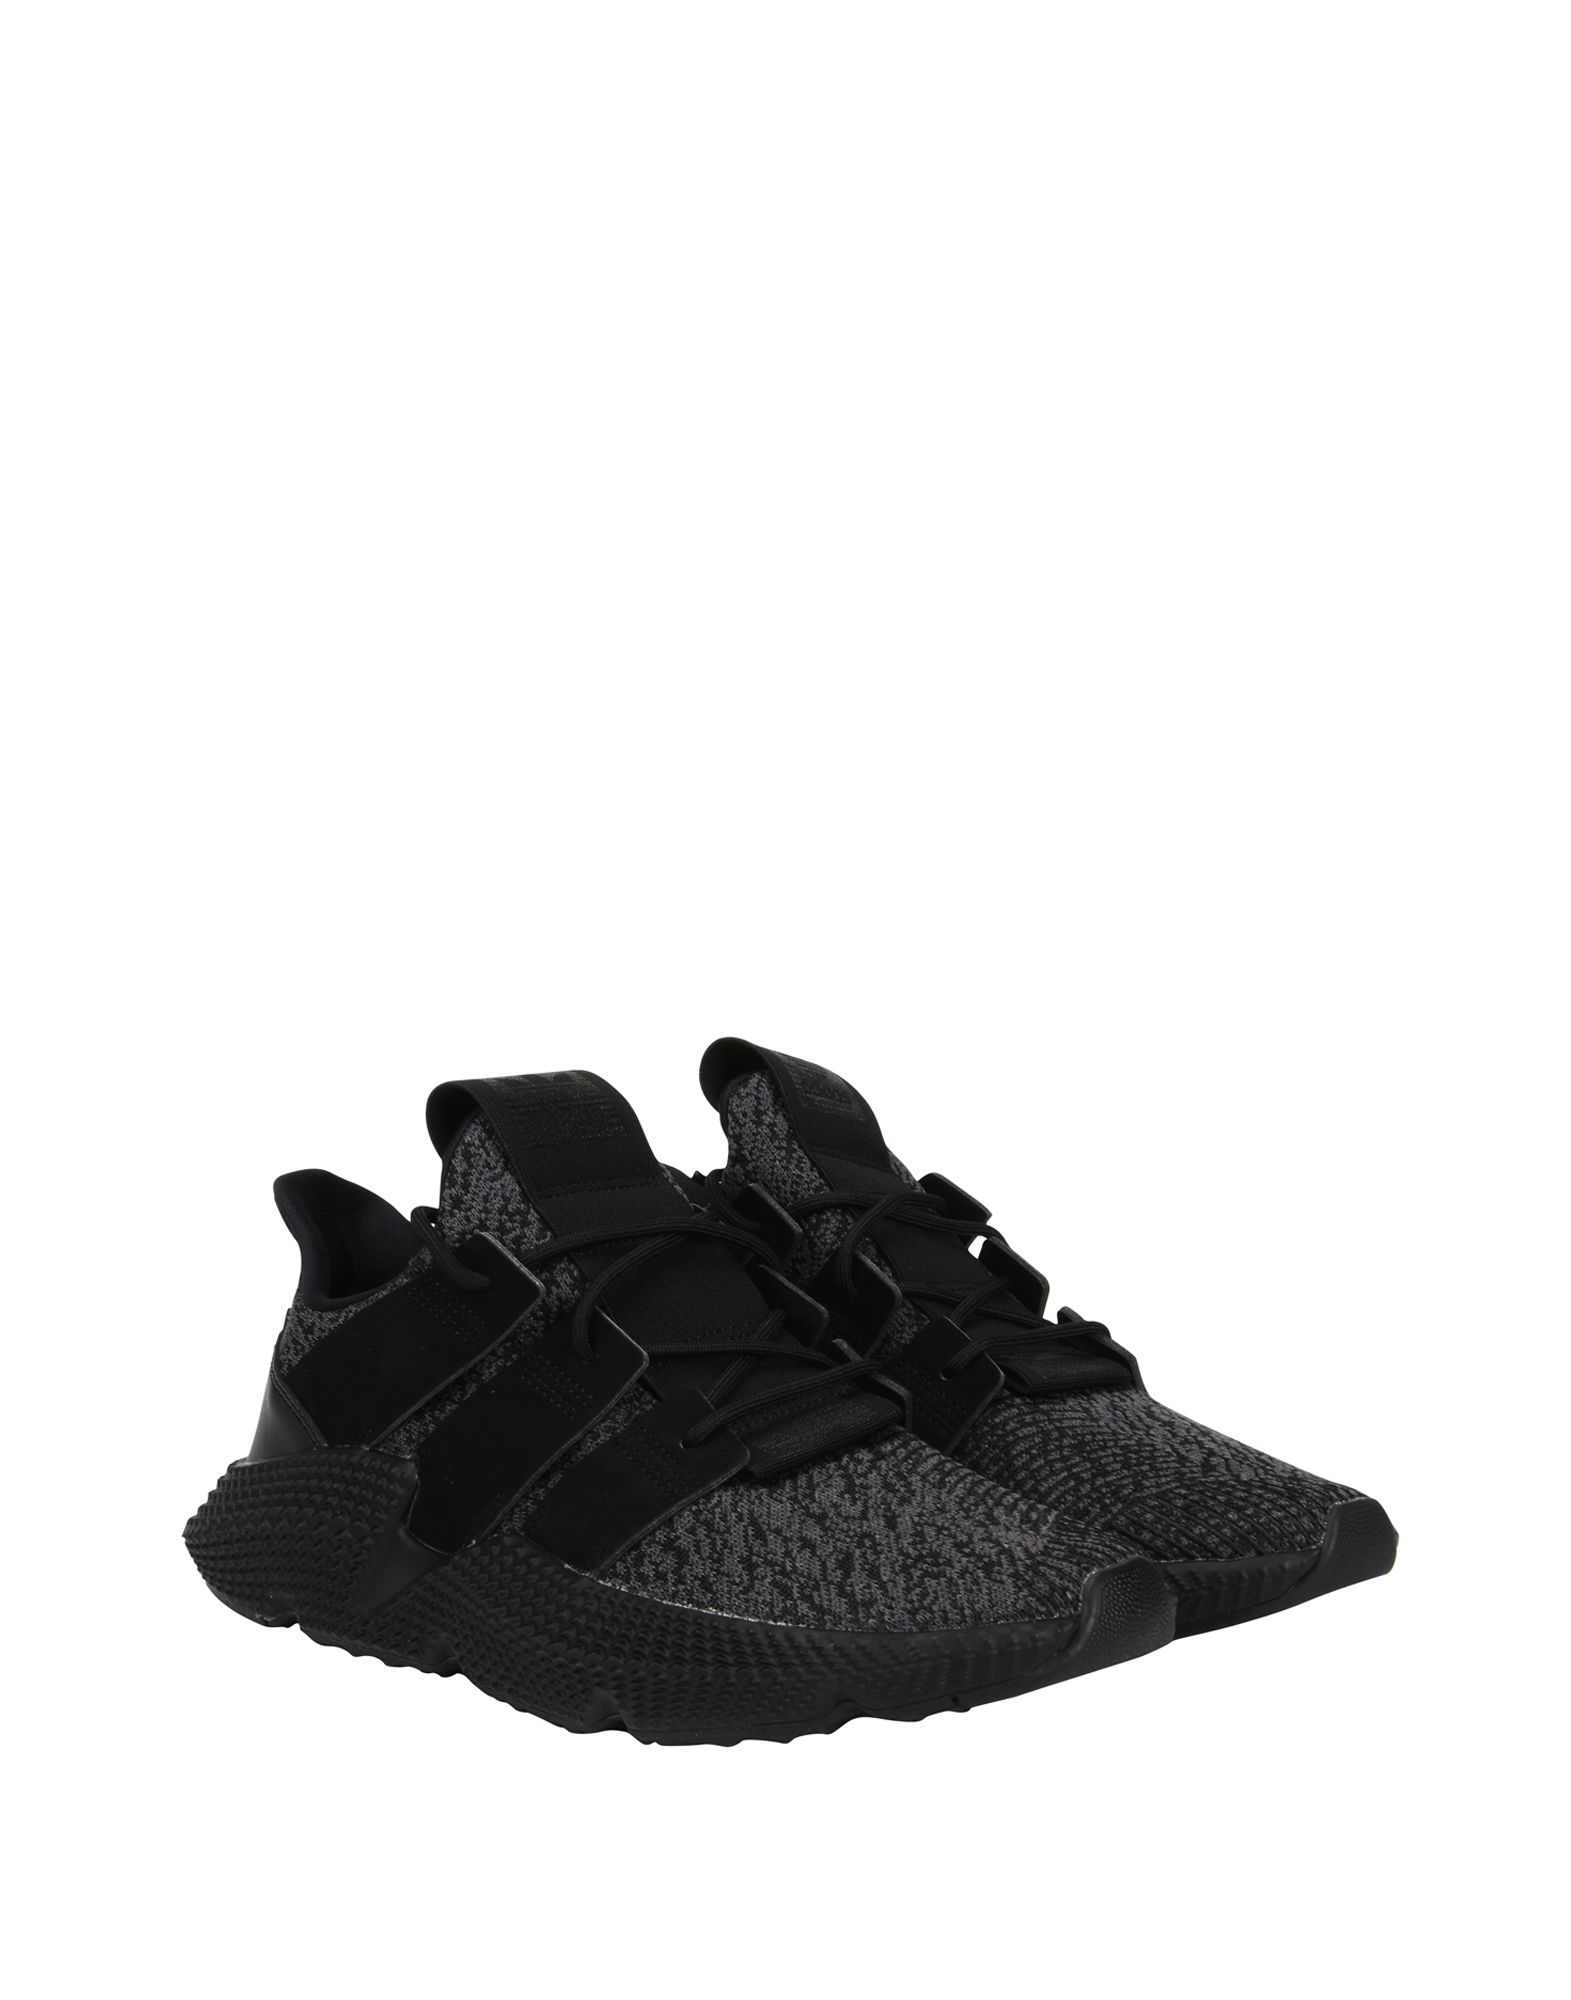 11446661PK Adidas Originals Prophere  11446661PK  Heiße Schuhe 641187